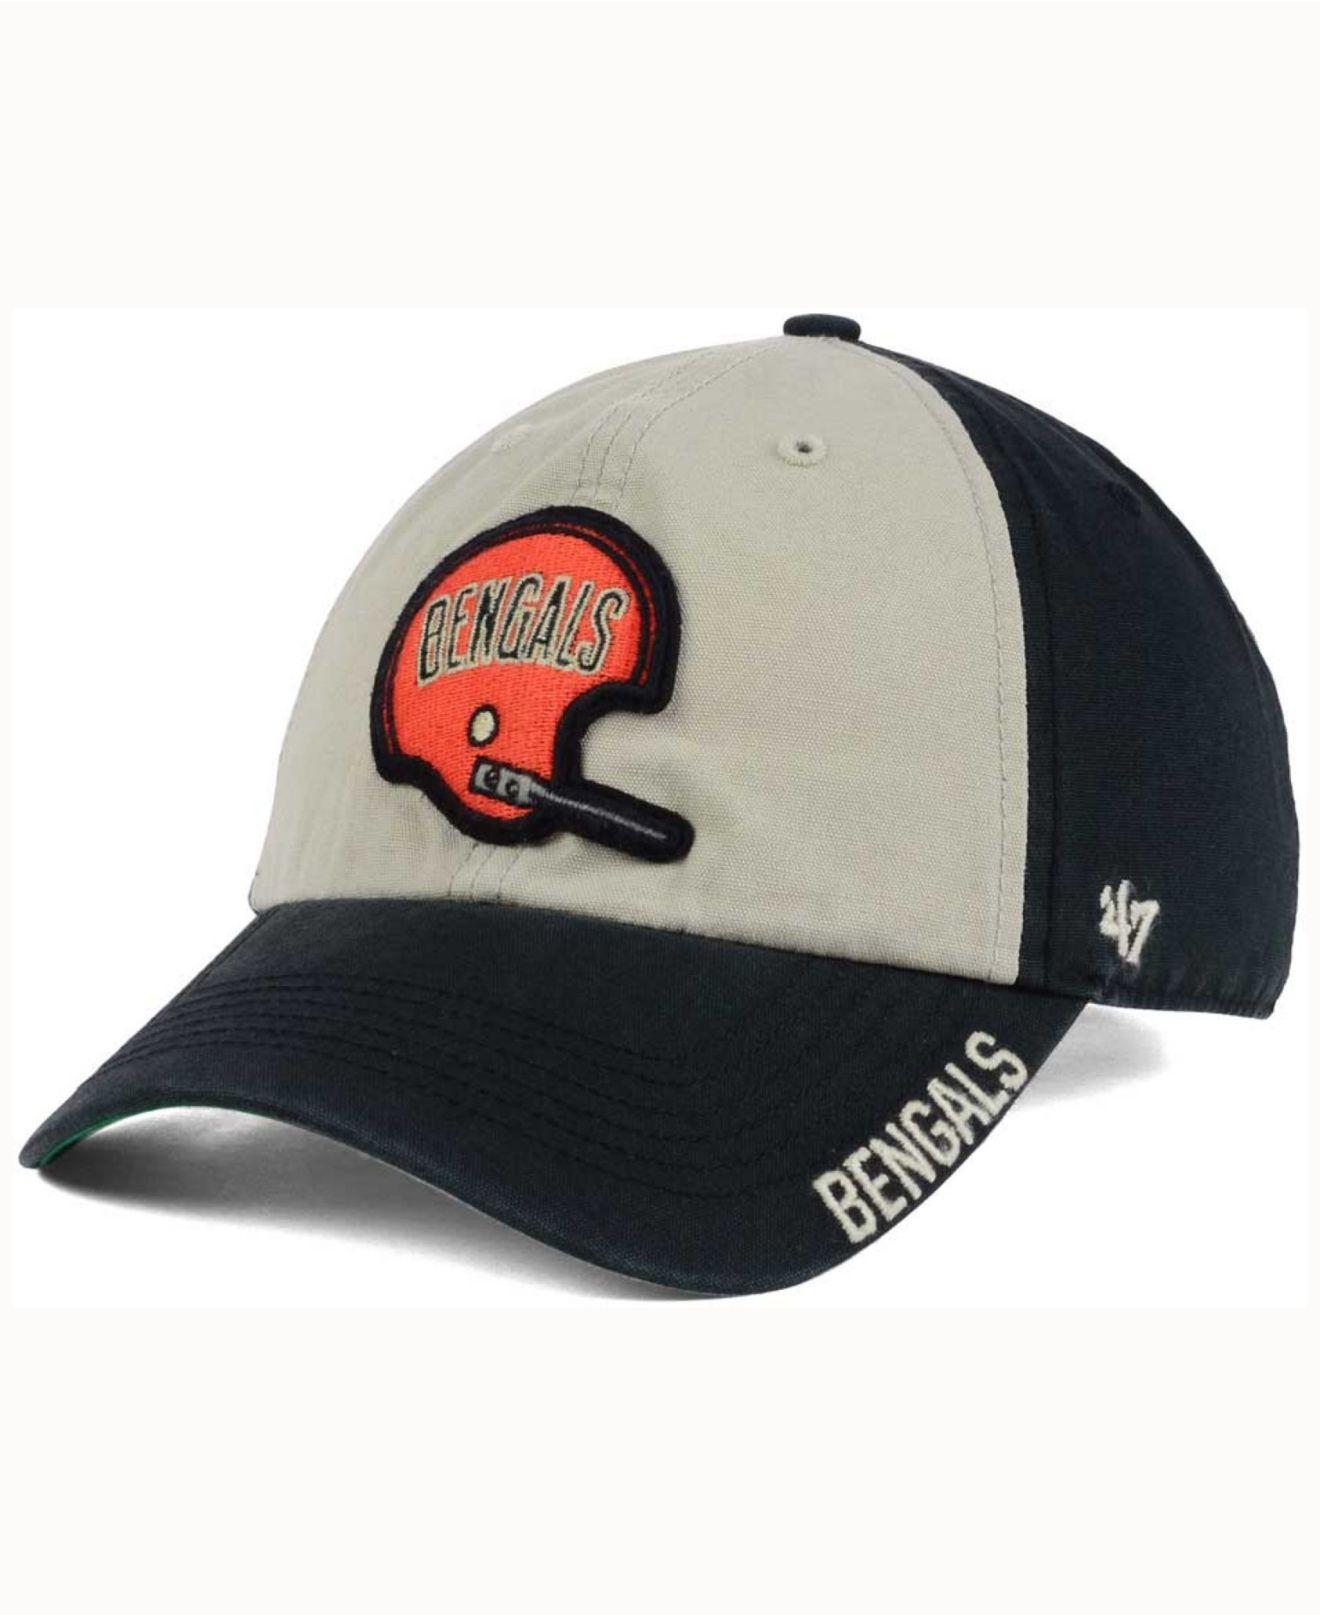 best service 2f362 6572c Lyst - 47 Brand Middlebrook Clean Up Cap in Black for Men